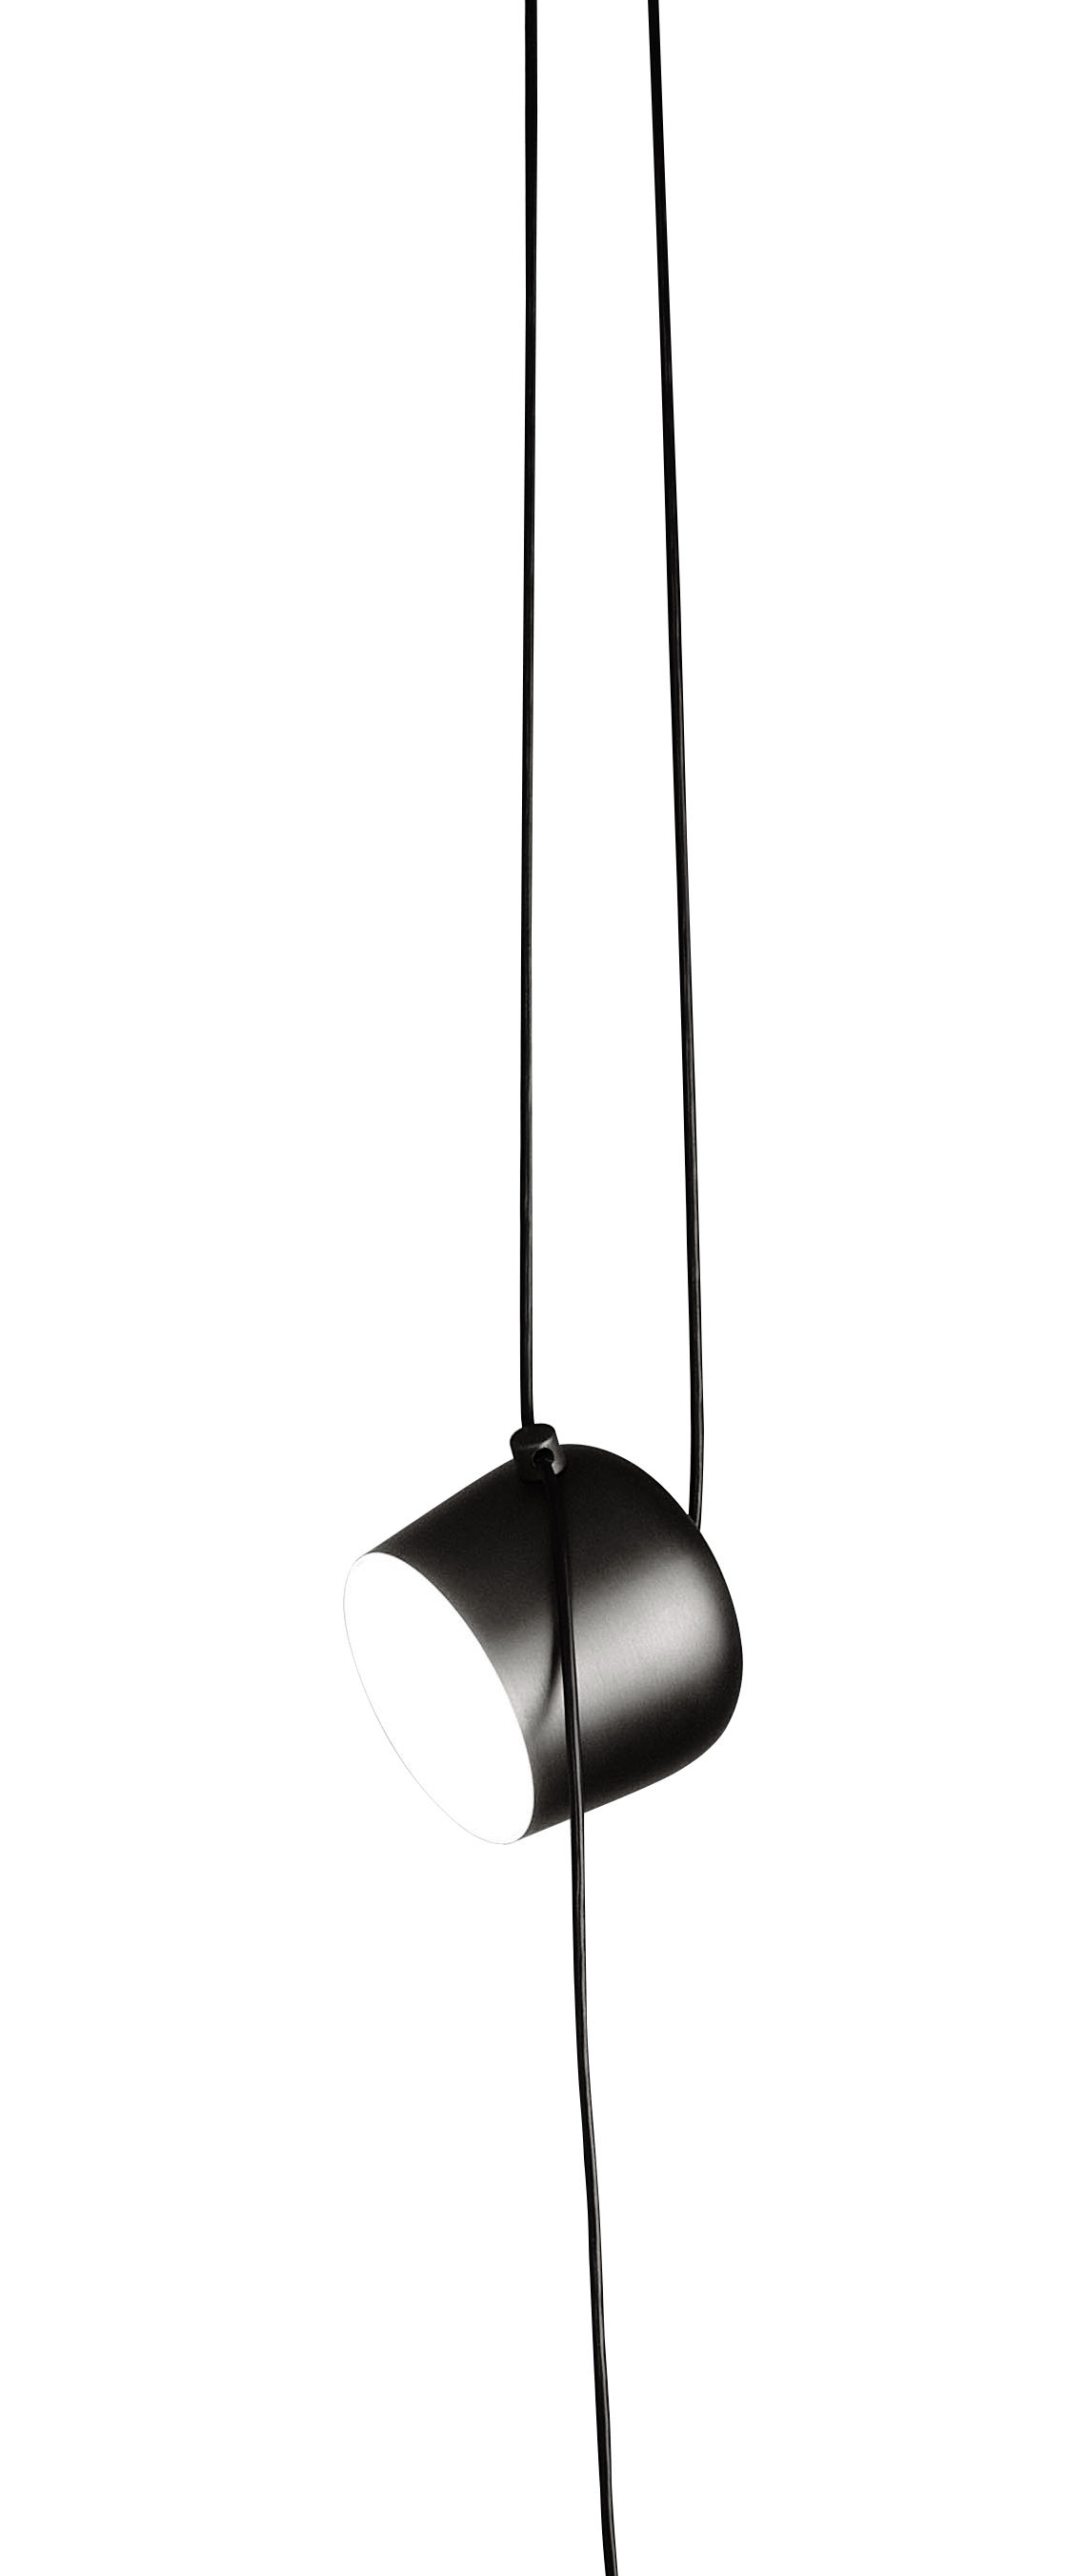 Leuchten - Pendelleuchten - AIM Small Pendelleuchte LED - Ø 17 cm - Flos - Schwarz - Aluminium, Polykarbonat